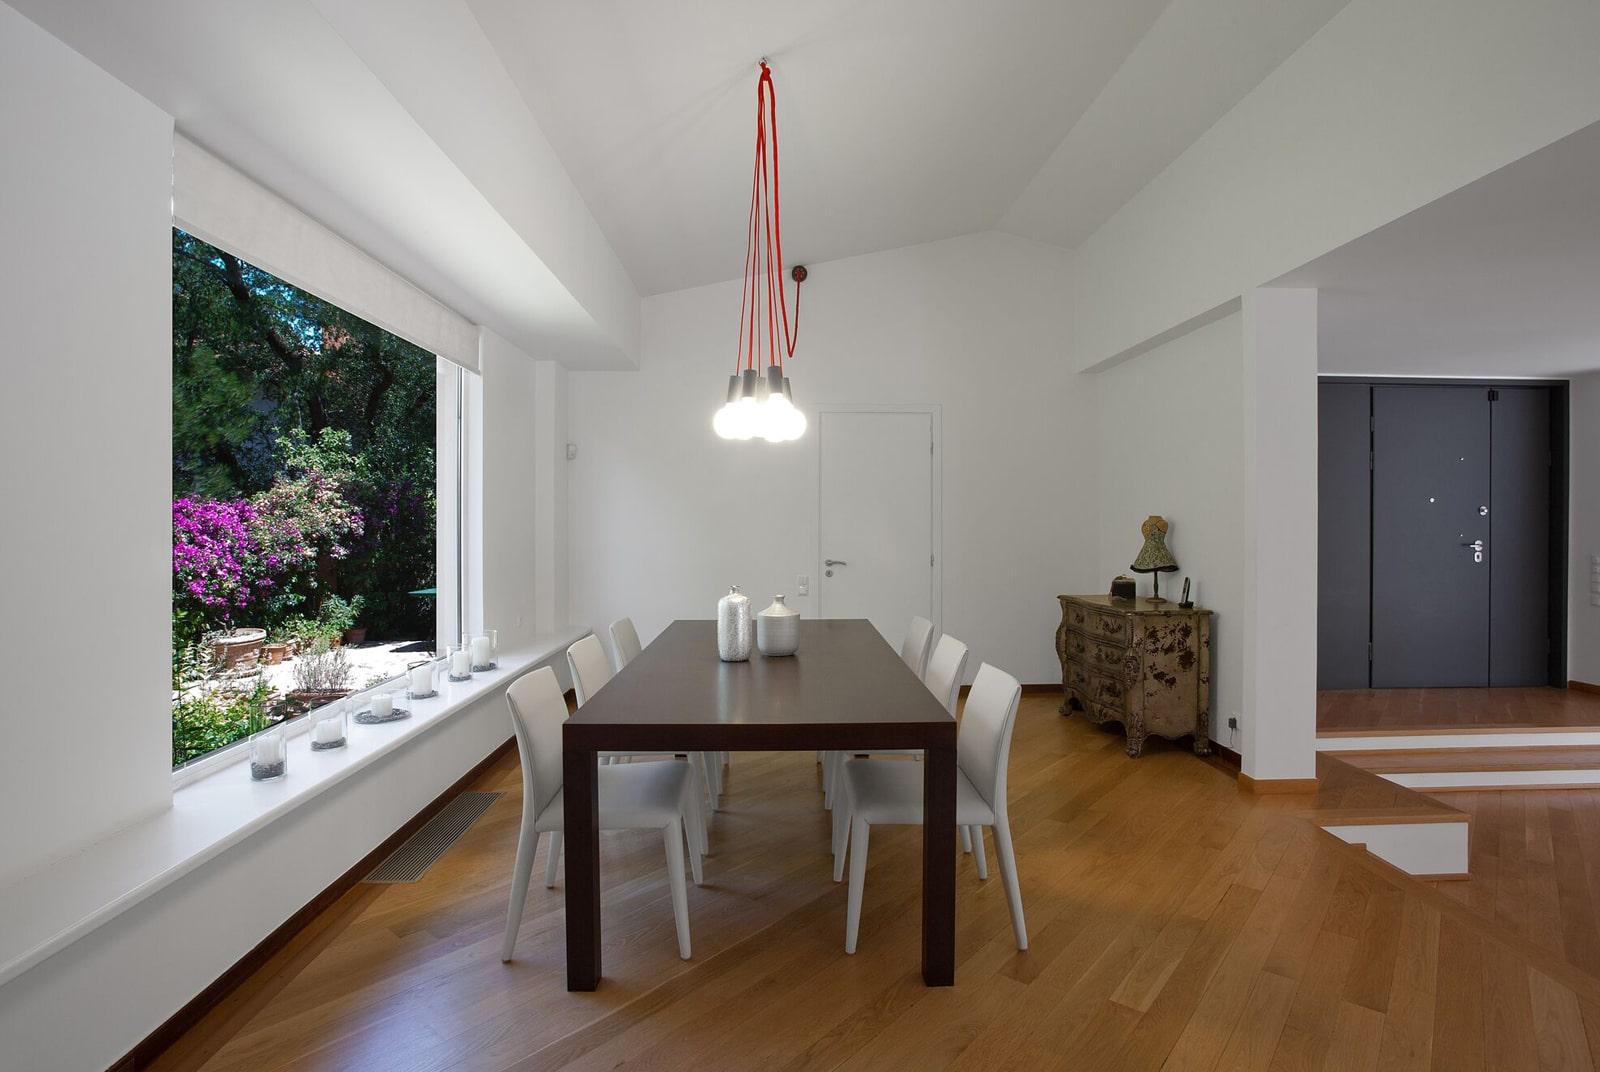 Dining room decoration - The Simply Elegant Villa